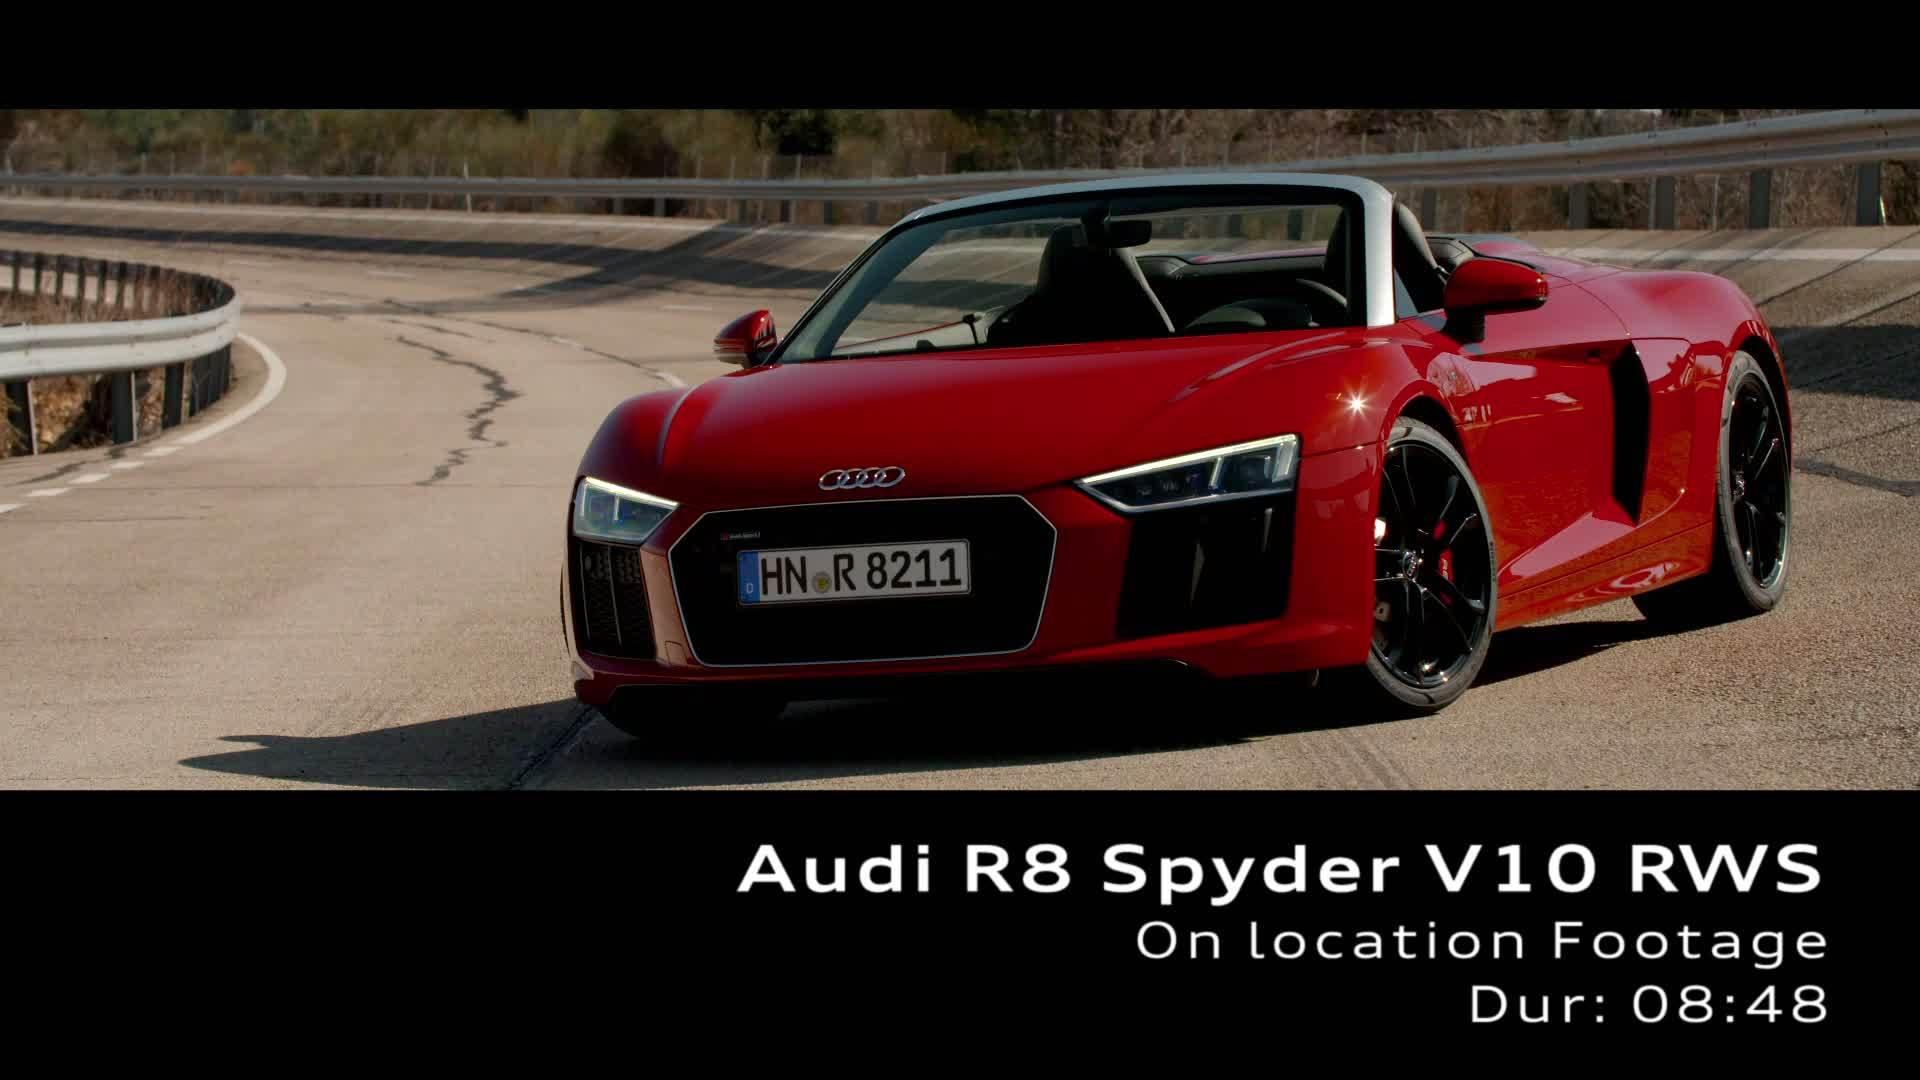 Footage Audi R8 Spyder V10 RWS